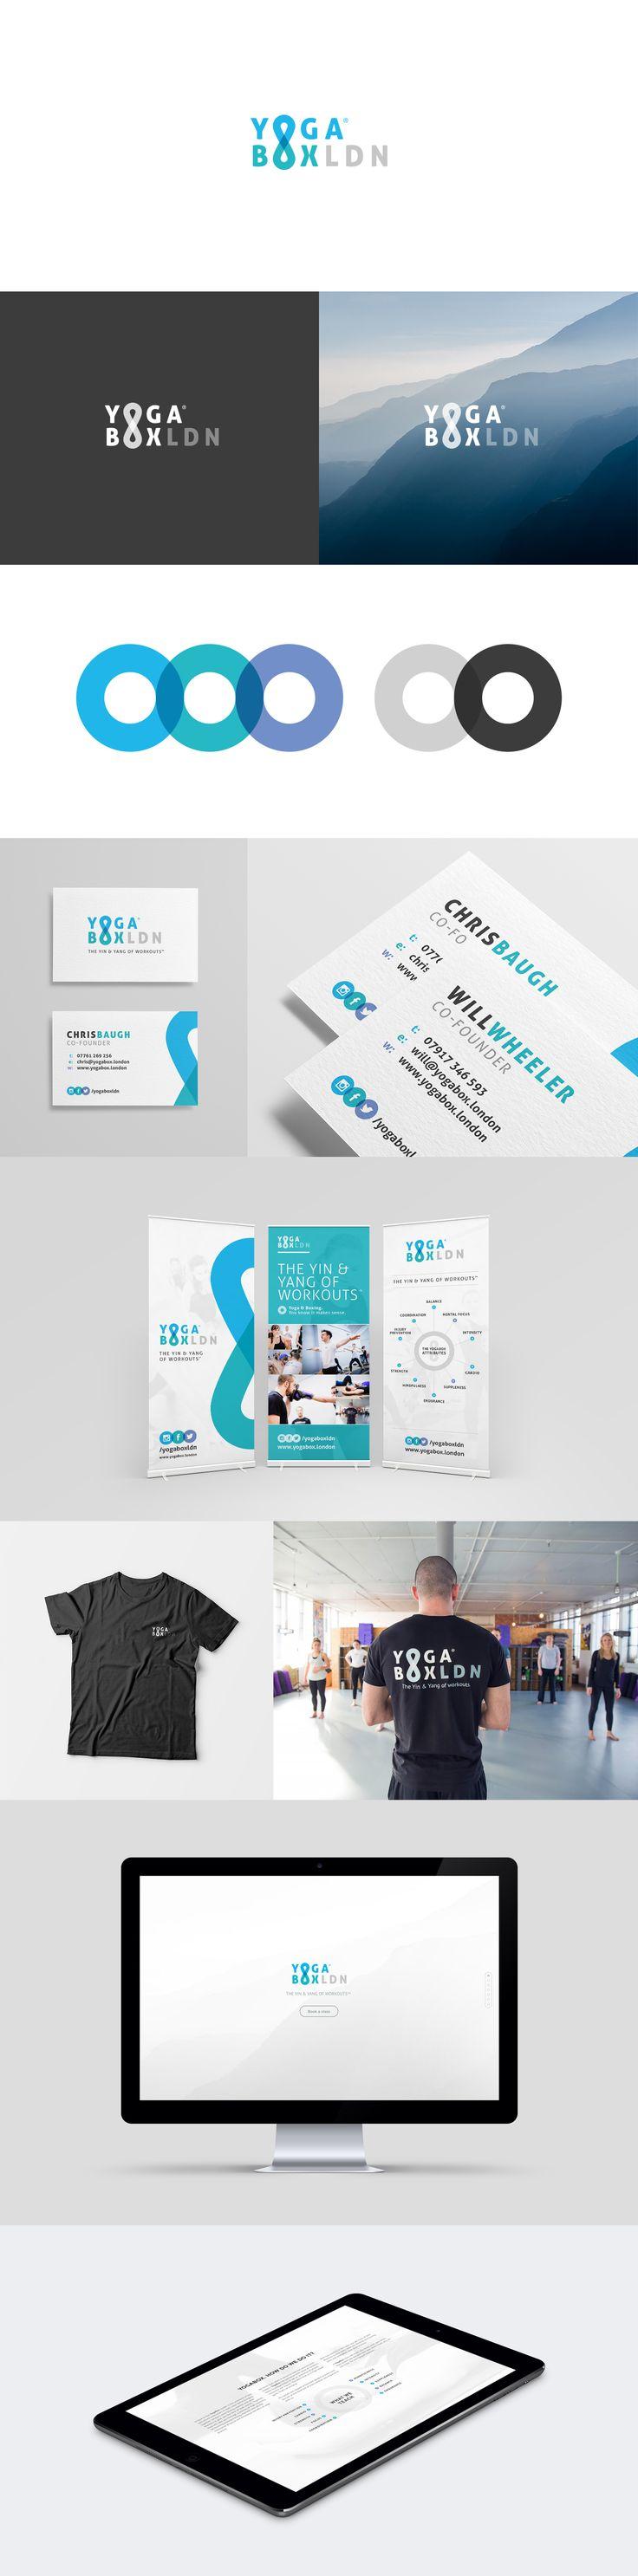 YogaBoxLDN - Branding, Marketing Materials and Website; http://be.net/gallery/36977907/YogaBoxLDN